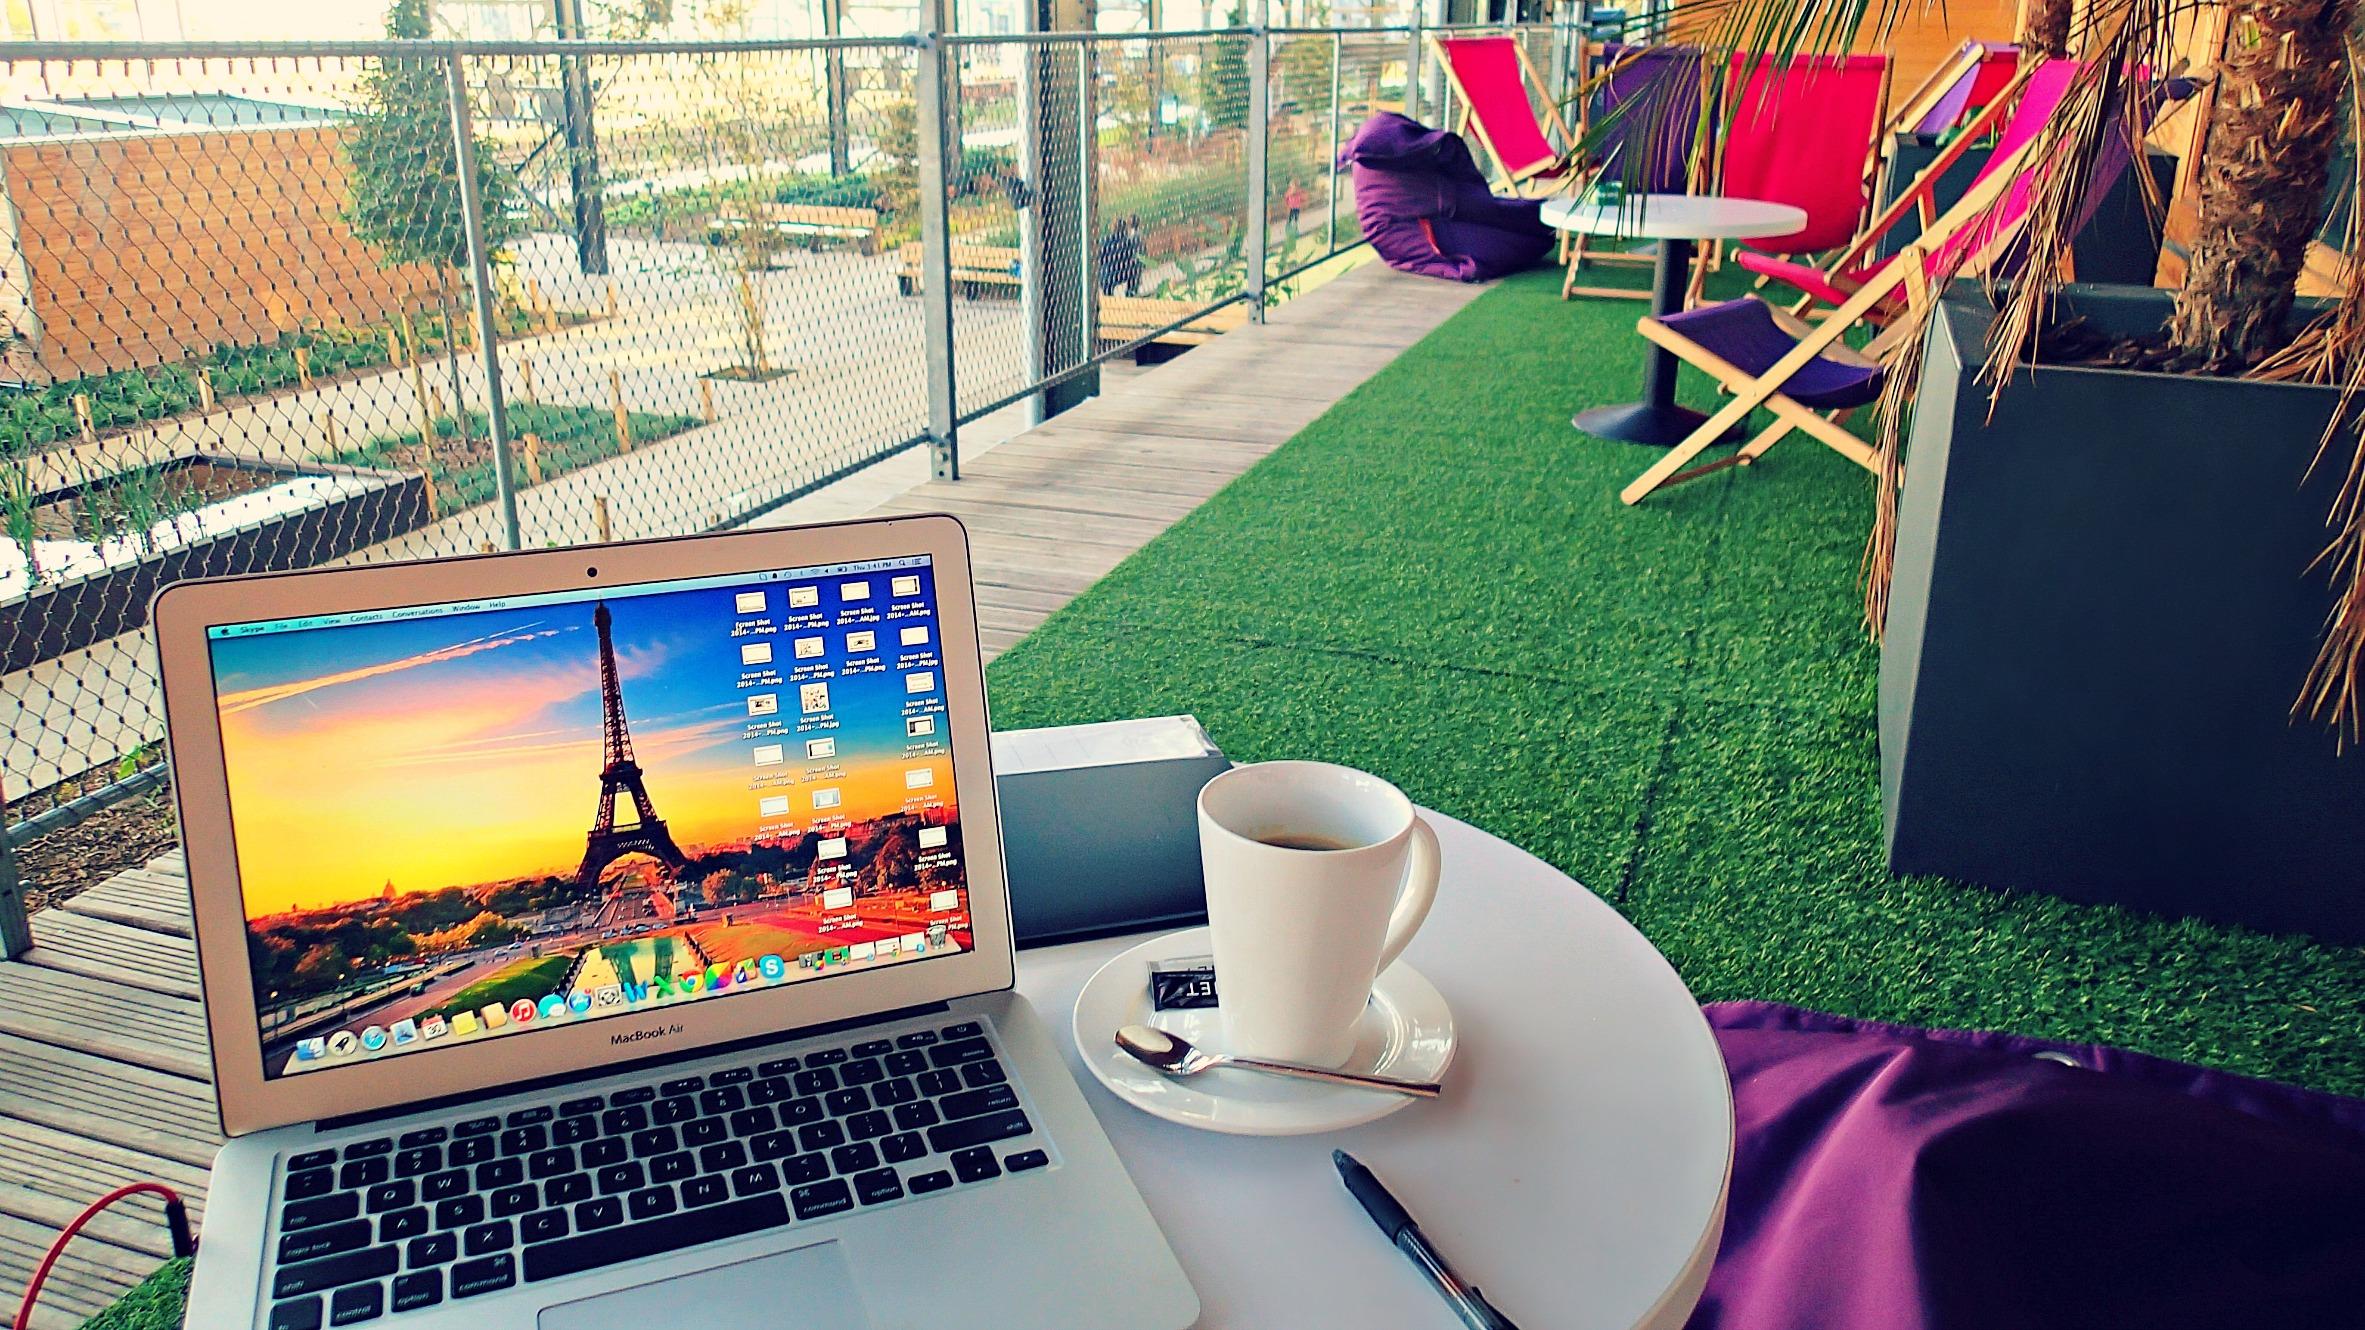 P10101851 Big Blog X: Breakfast at the Hostel!